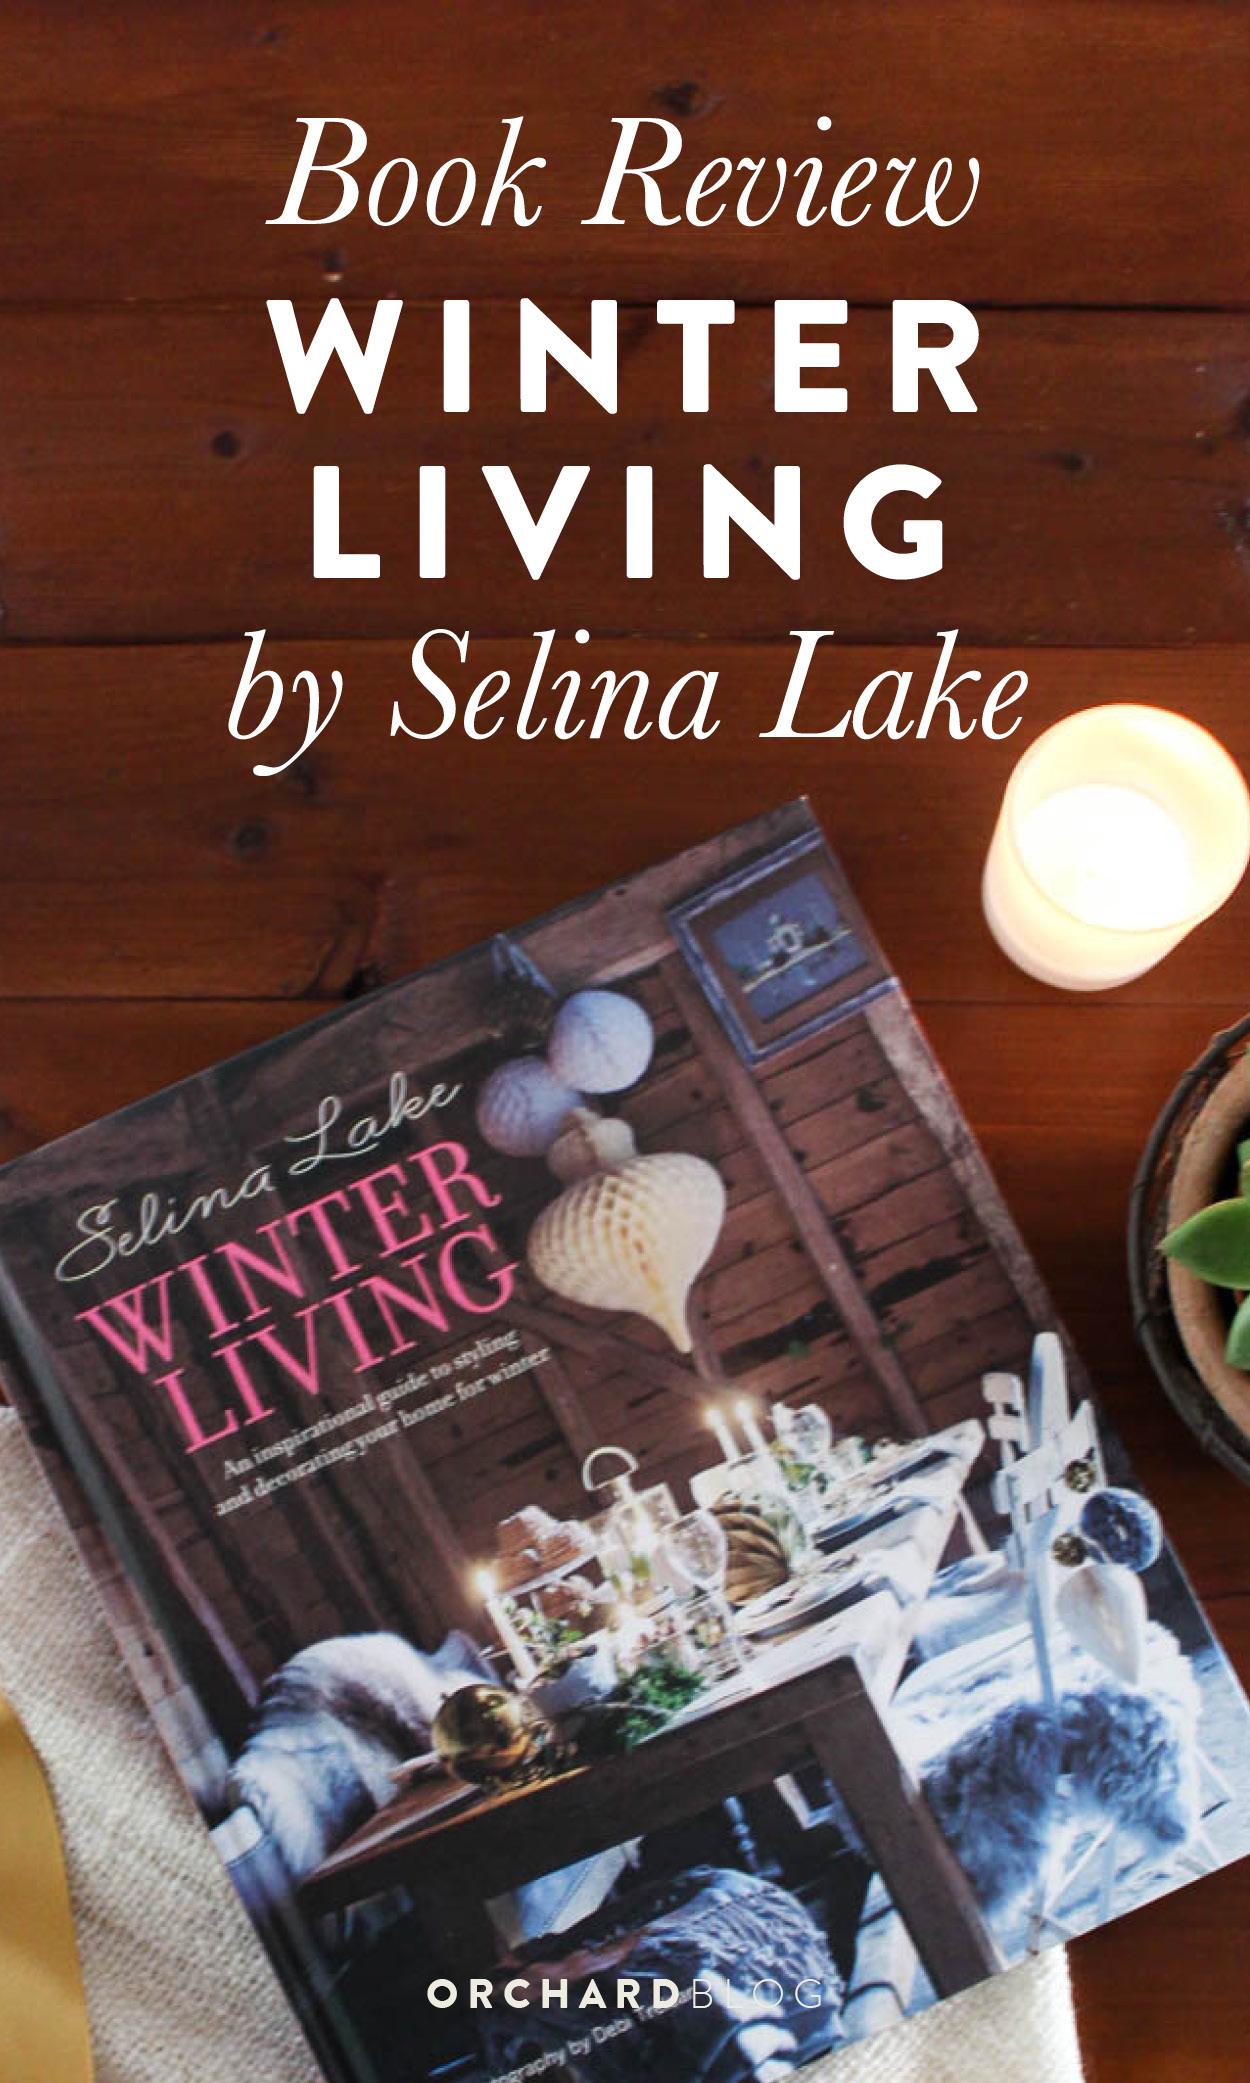 Winter Living by Selina Lake